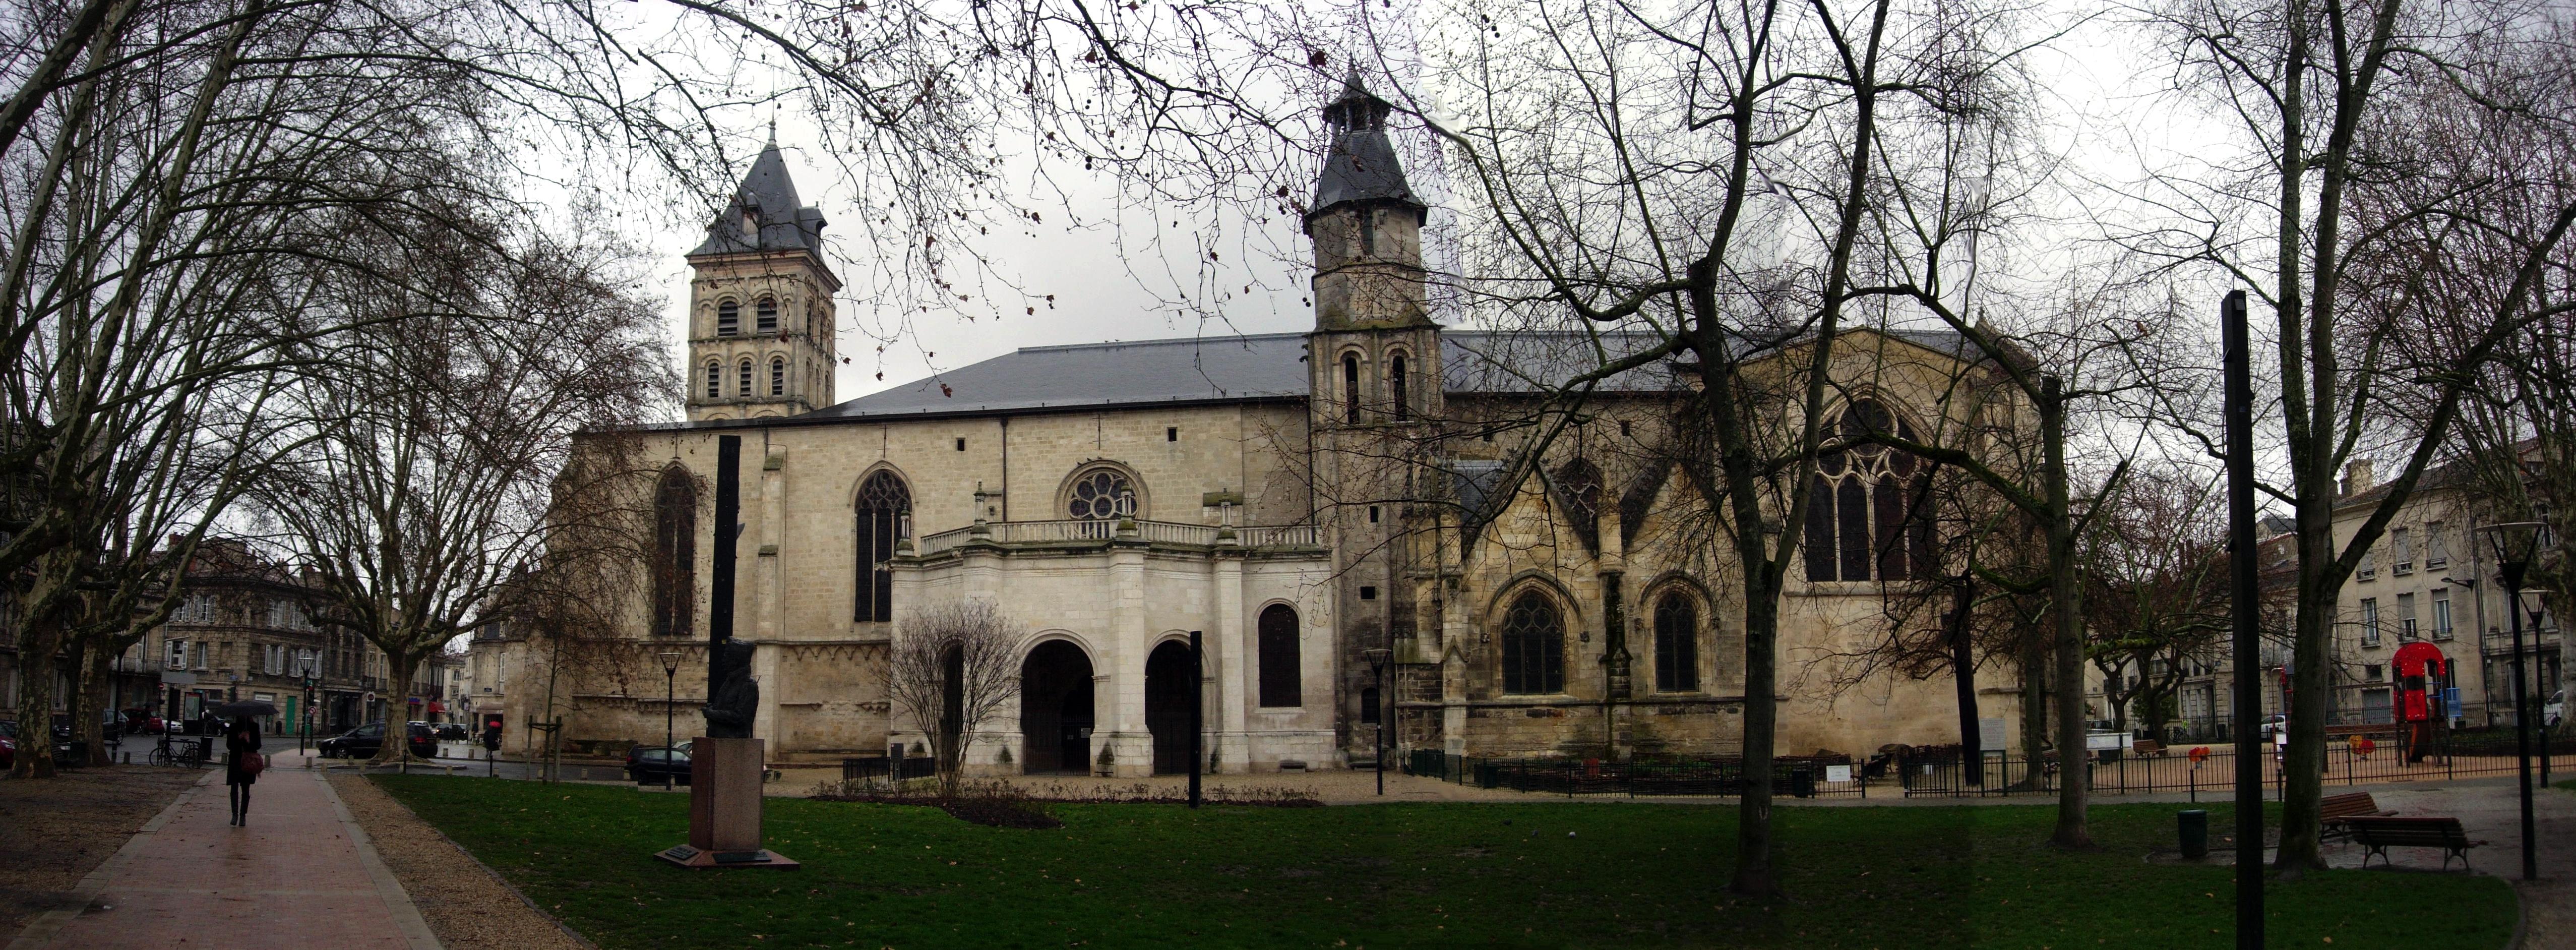 File:Saint-SeurinBordeaux.jpg